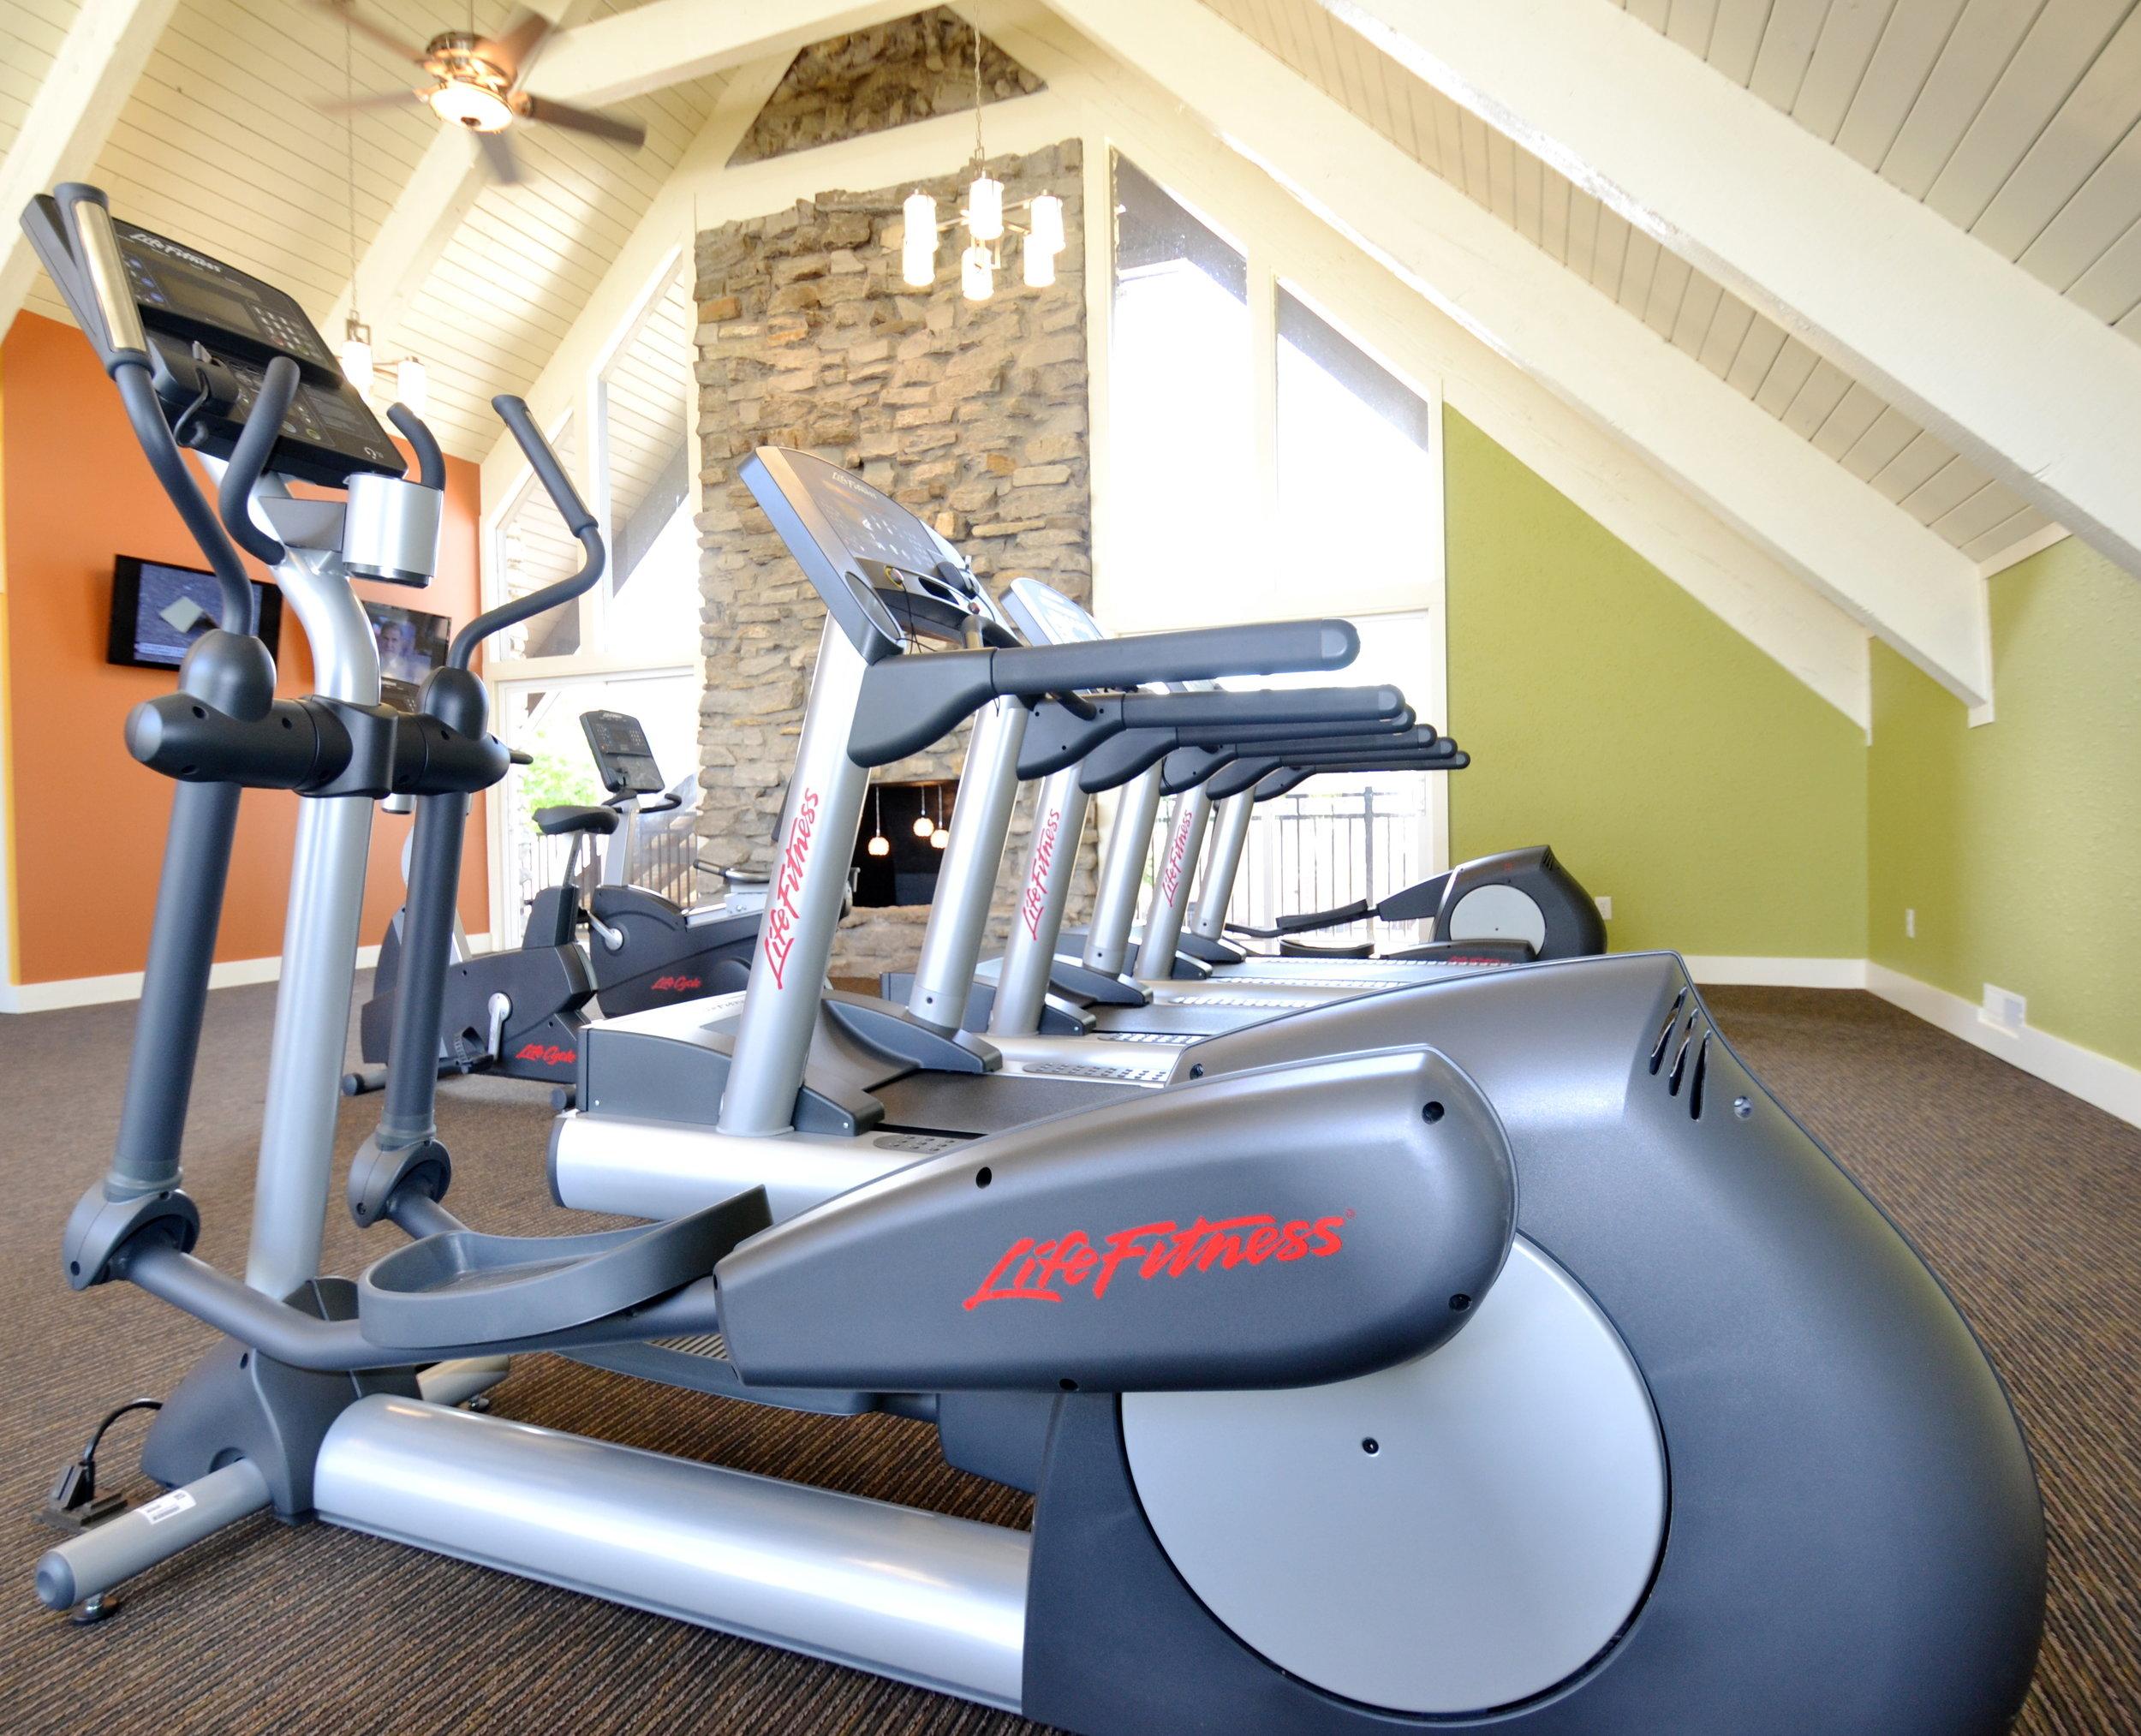 Westminster Fitness Center